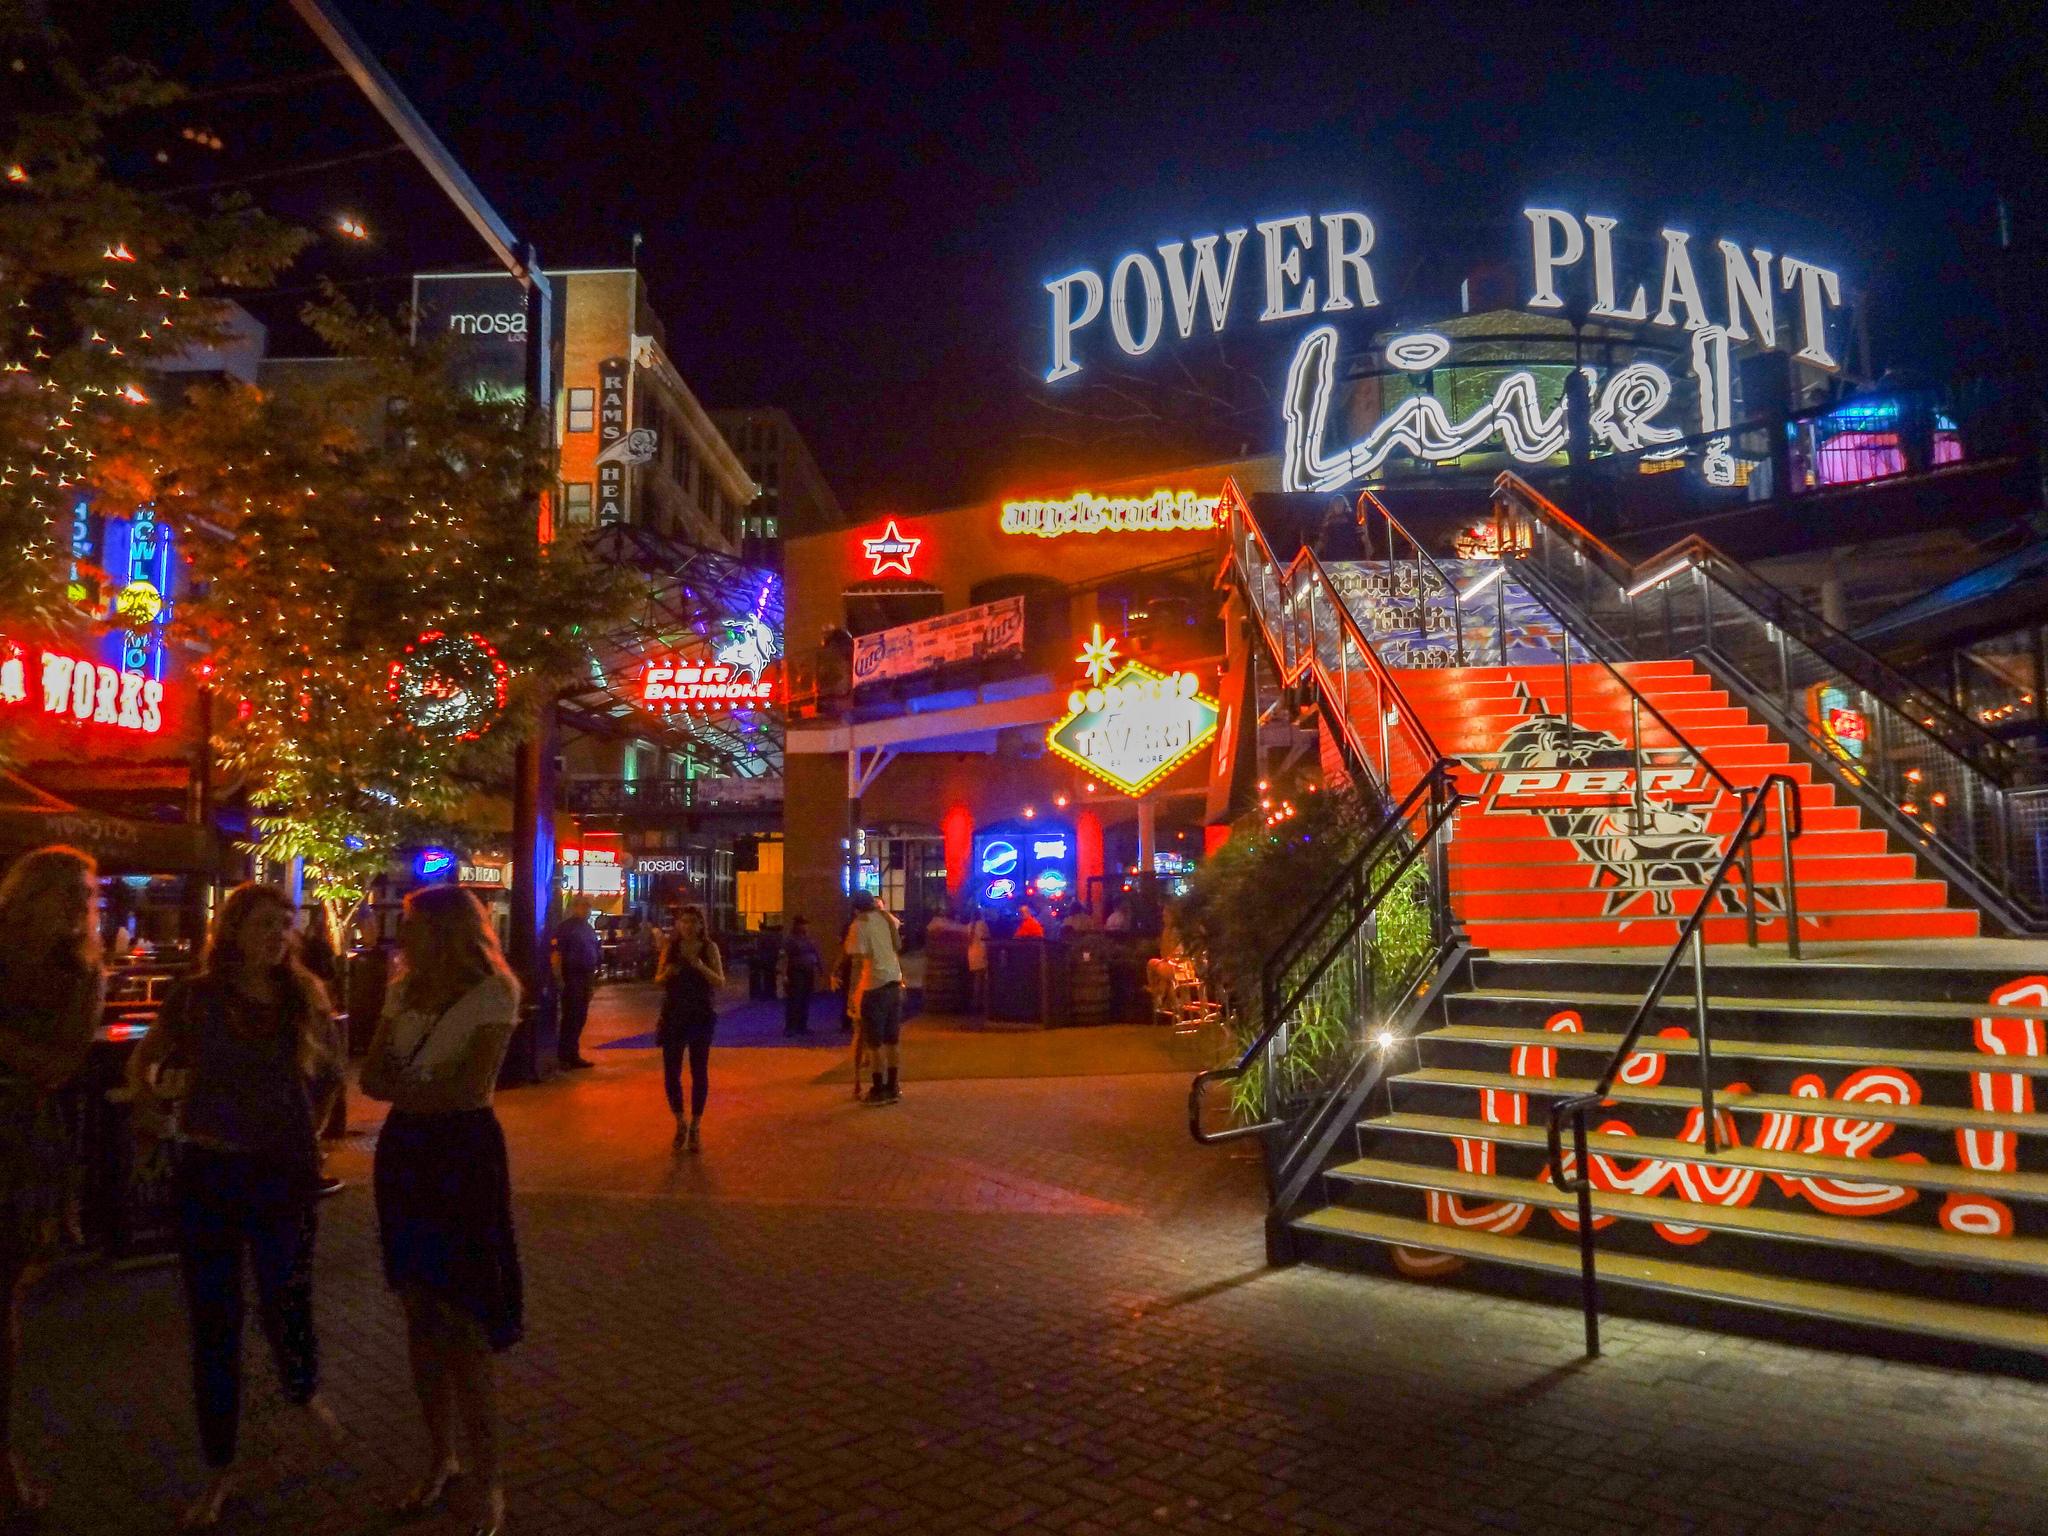 Power Plant Live! © Paul SablemanFlickr